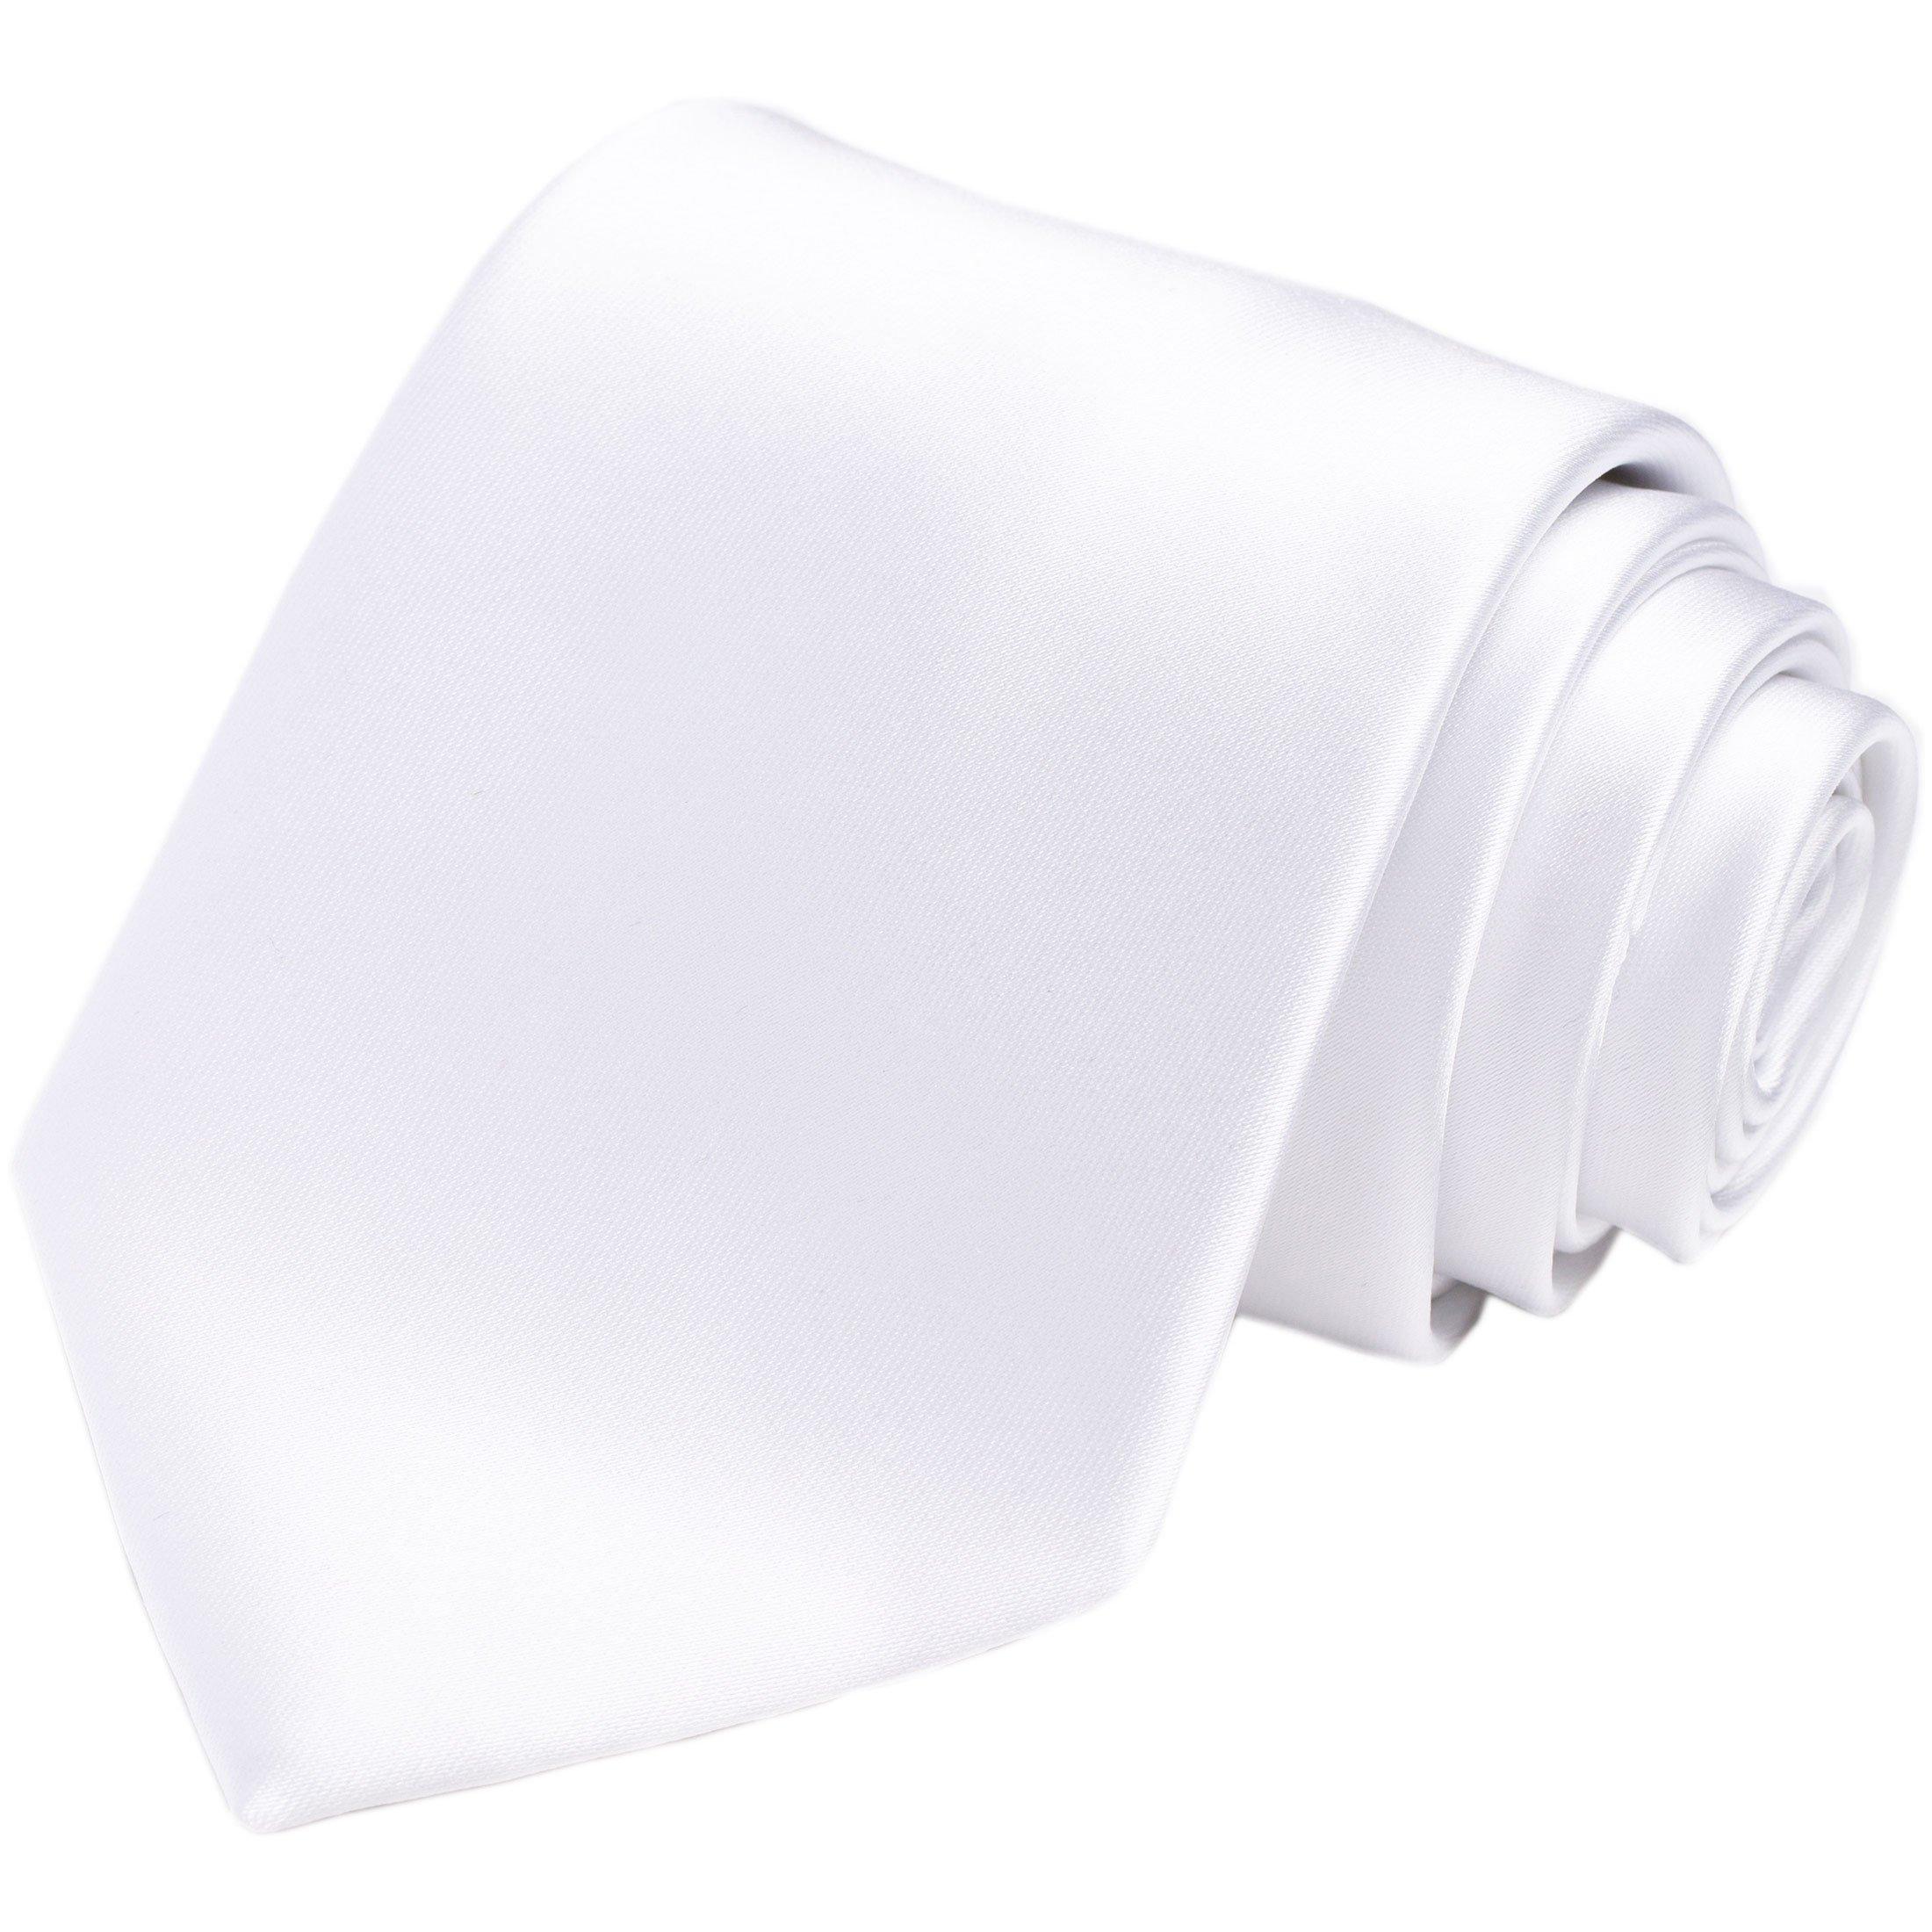 KissTies White Tie Mens Necktie Satin Wedding Ties + Gift Box by KissTies